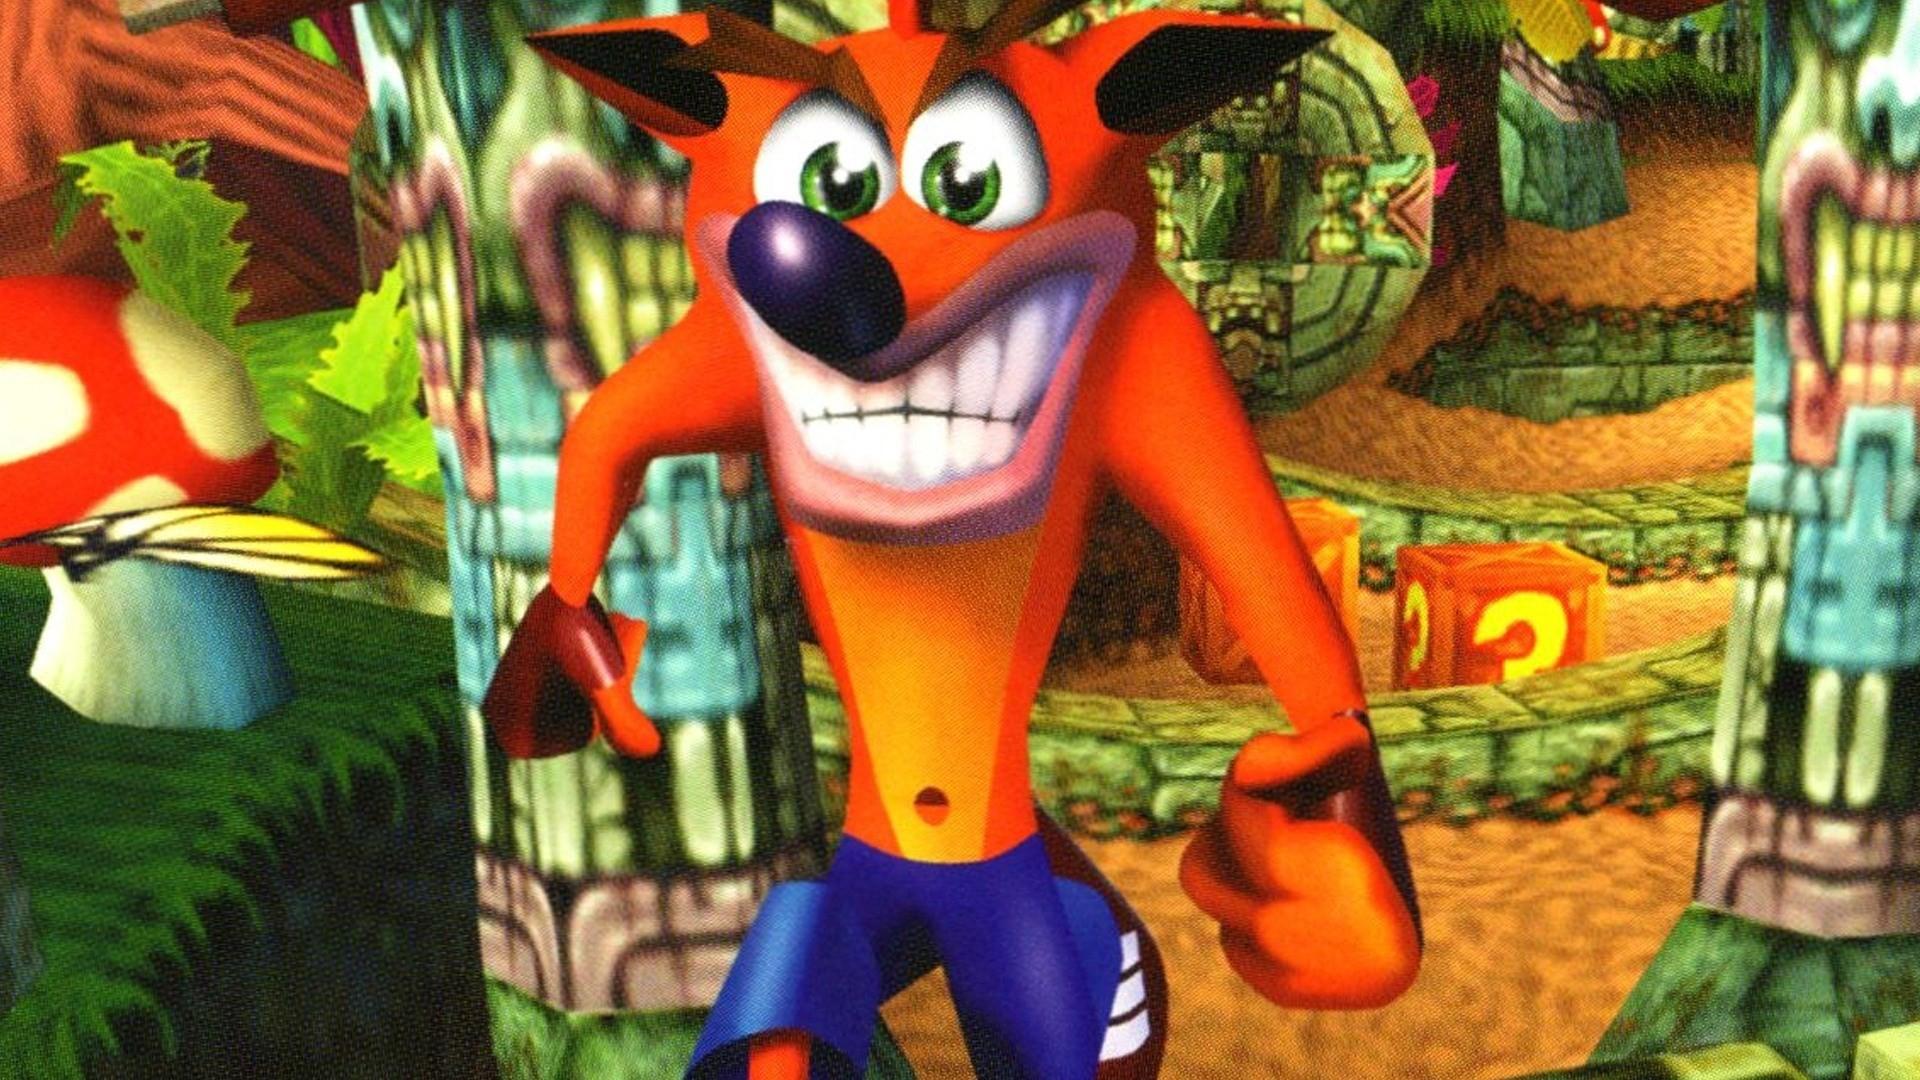 Crash Bandicoot High Quality